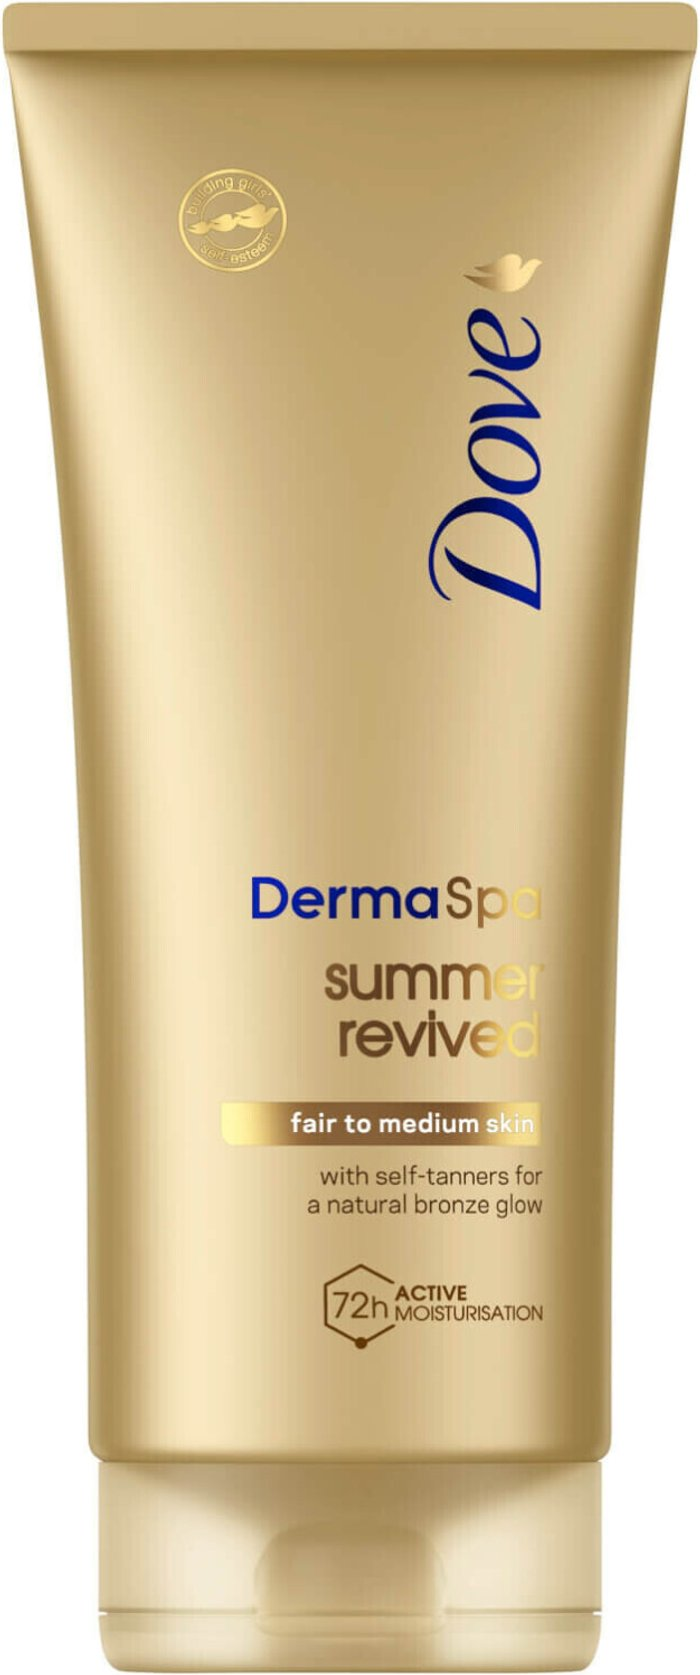 Dove Dove DermaSpa Summer Revived Self Tanning Body Lotion 200ml Fair to Medium